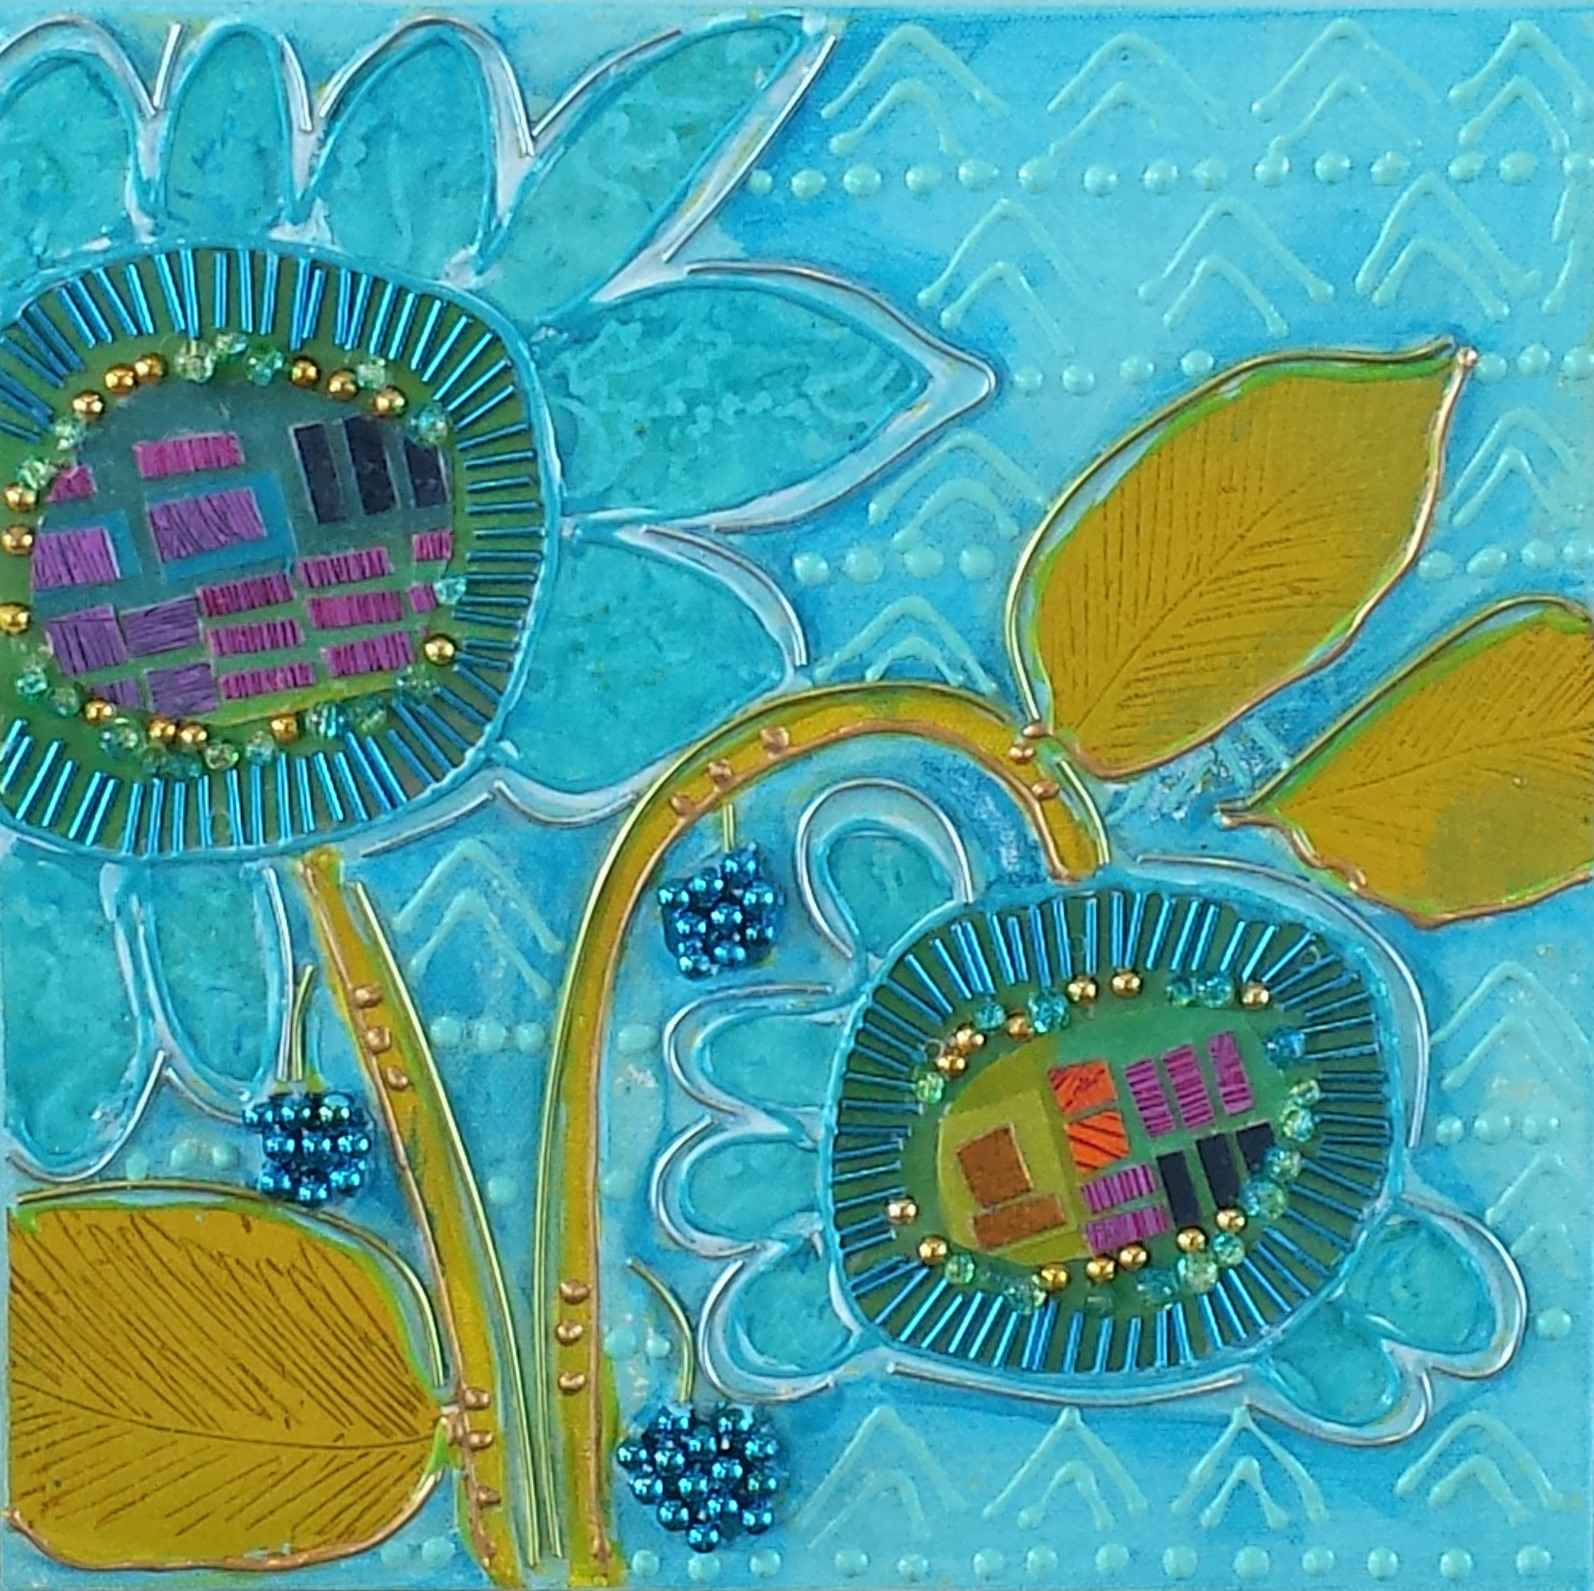 Blue Flower by  Thomas Kulich - Masterpiece Online